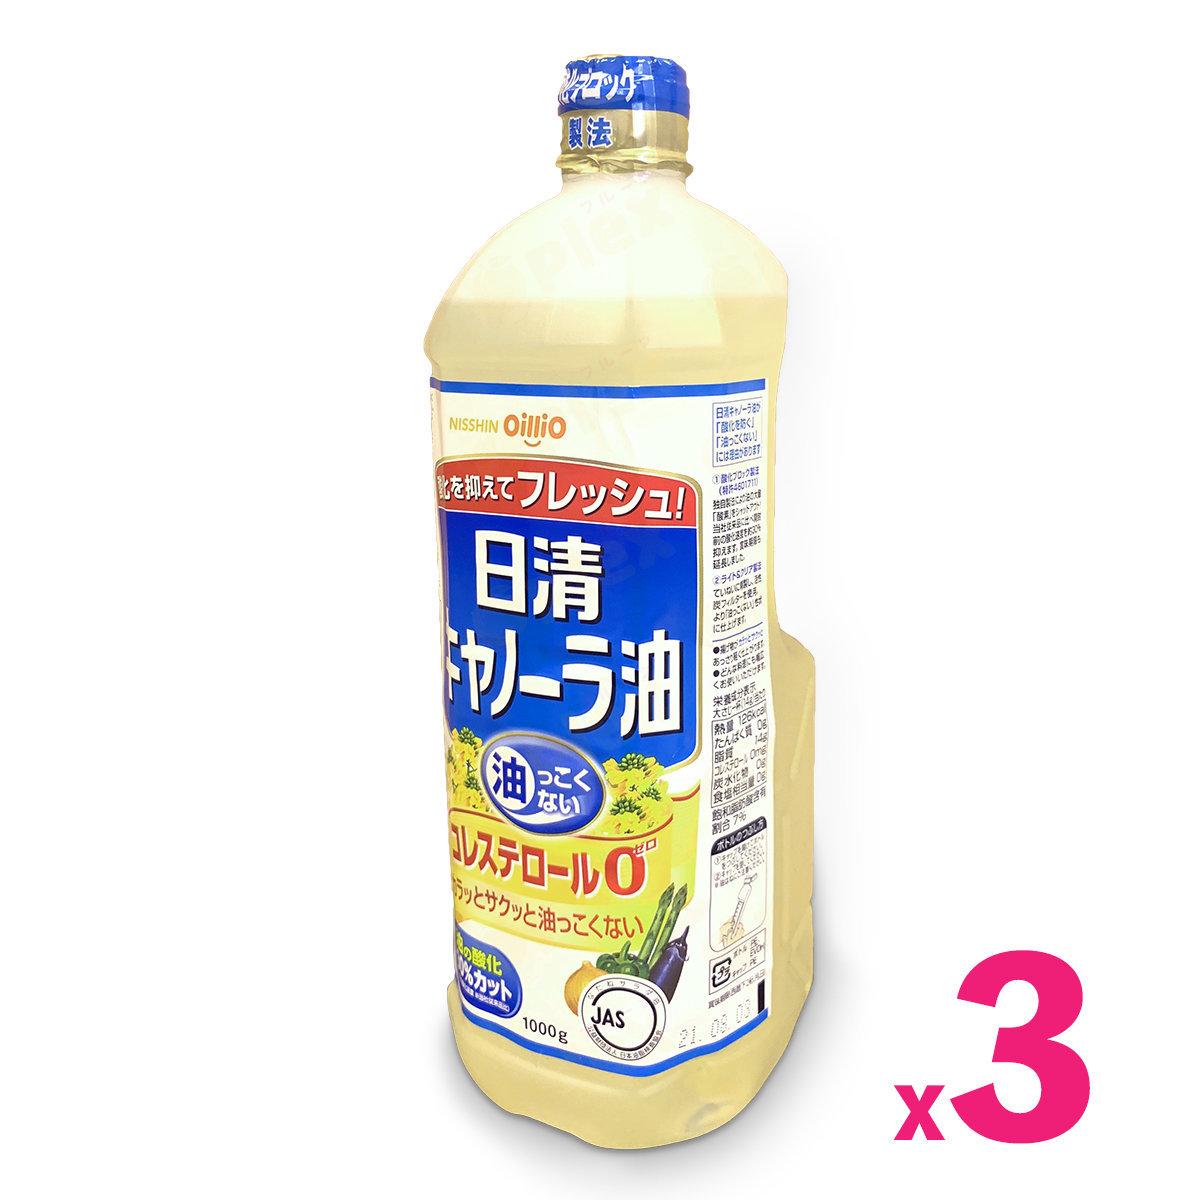 Oilio Zero Cholesterol Canola Oil (1000ml) x 3bottles